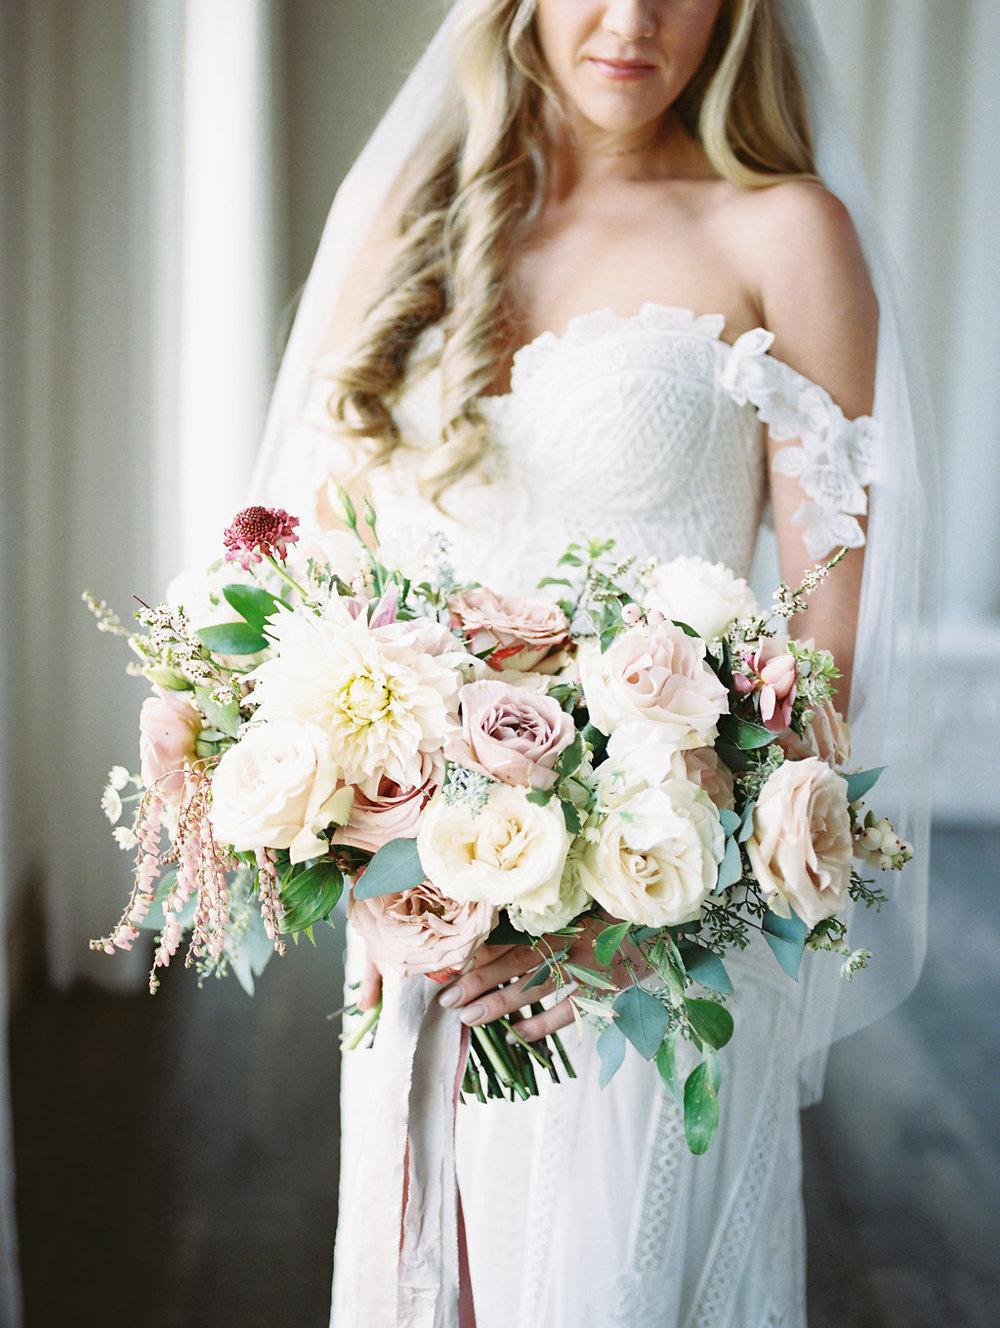 Dallas Wedding Florist - Wedfully Yours